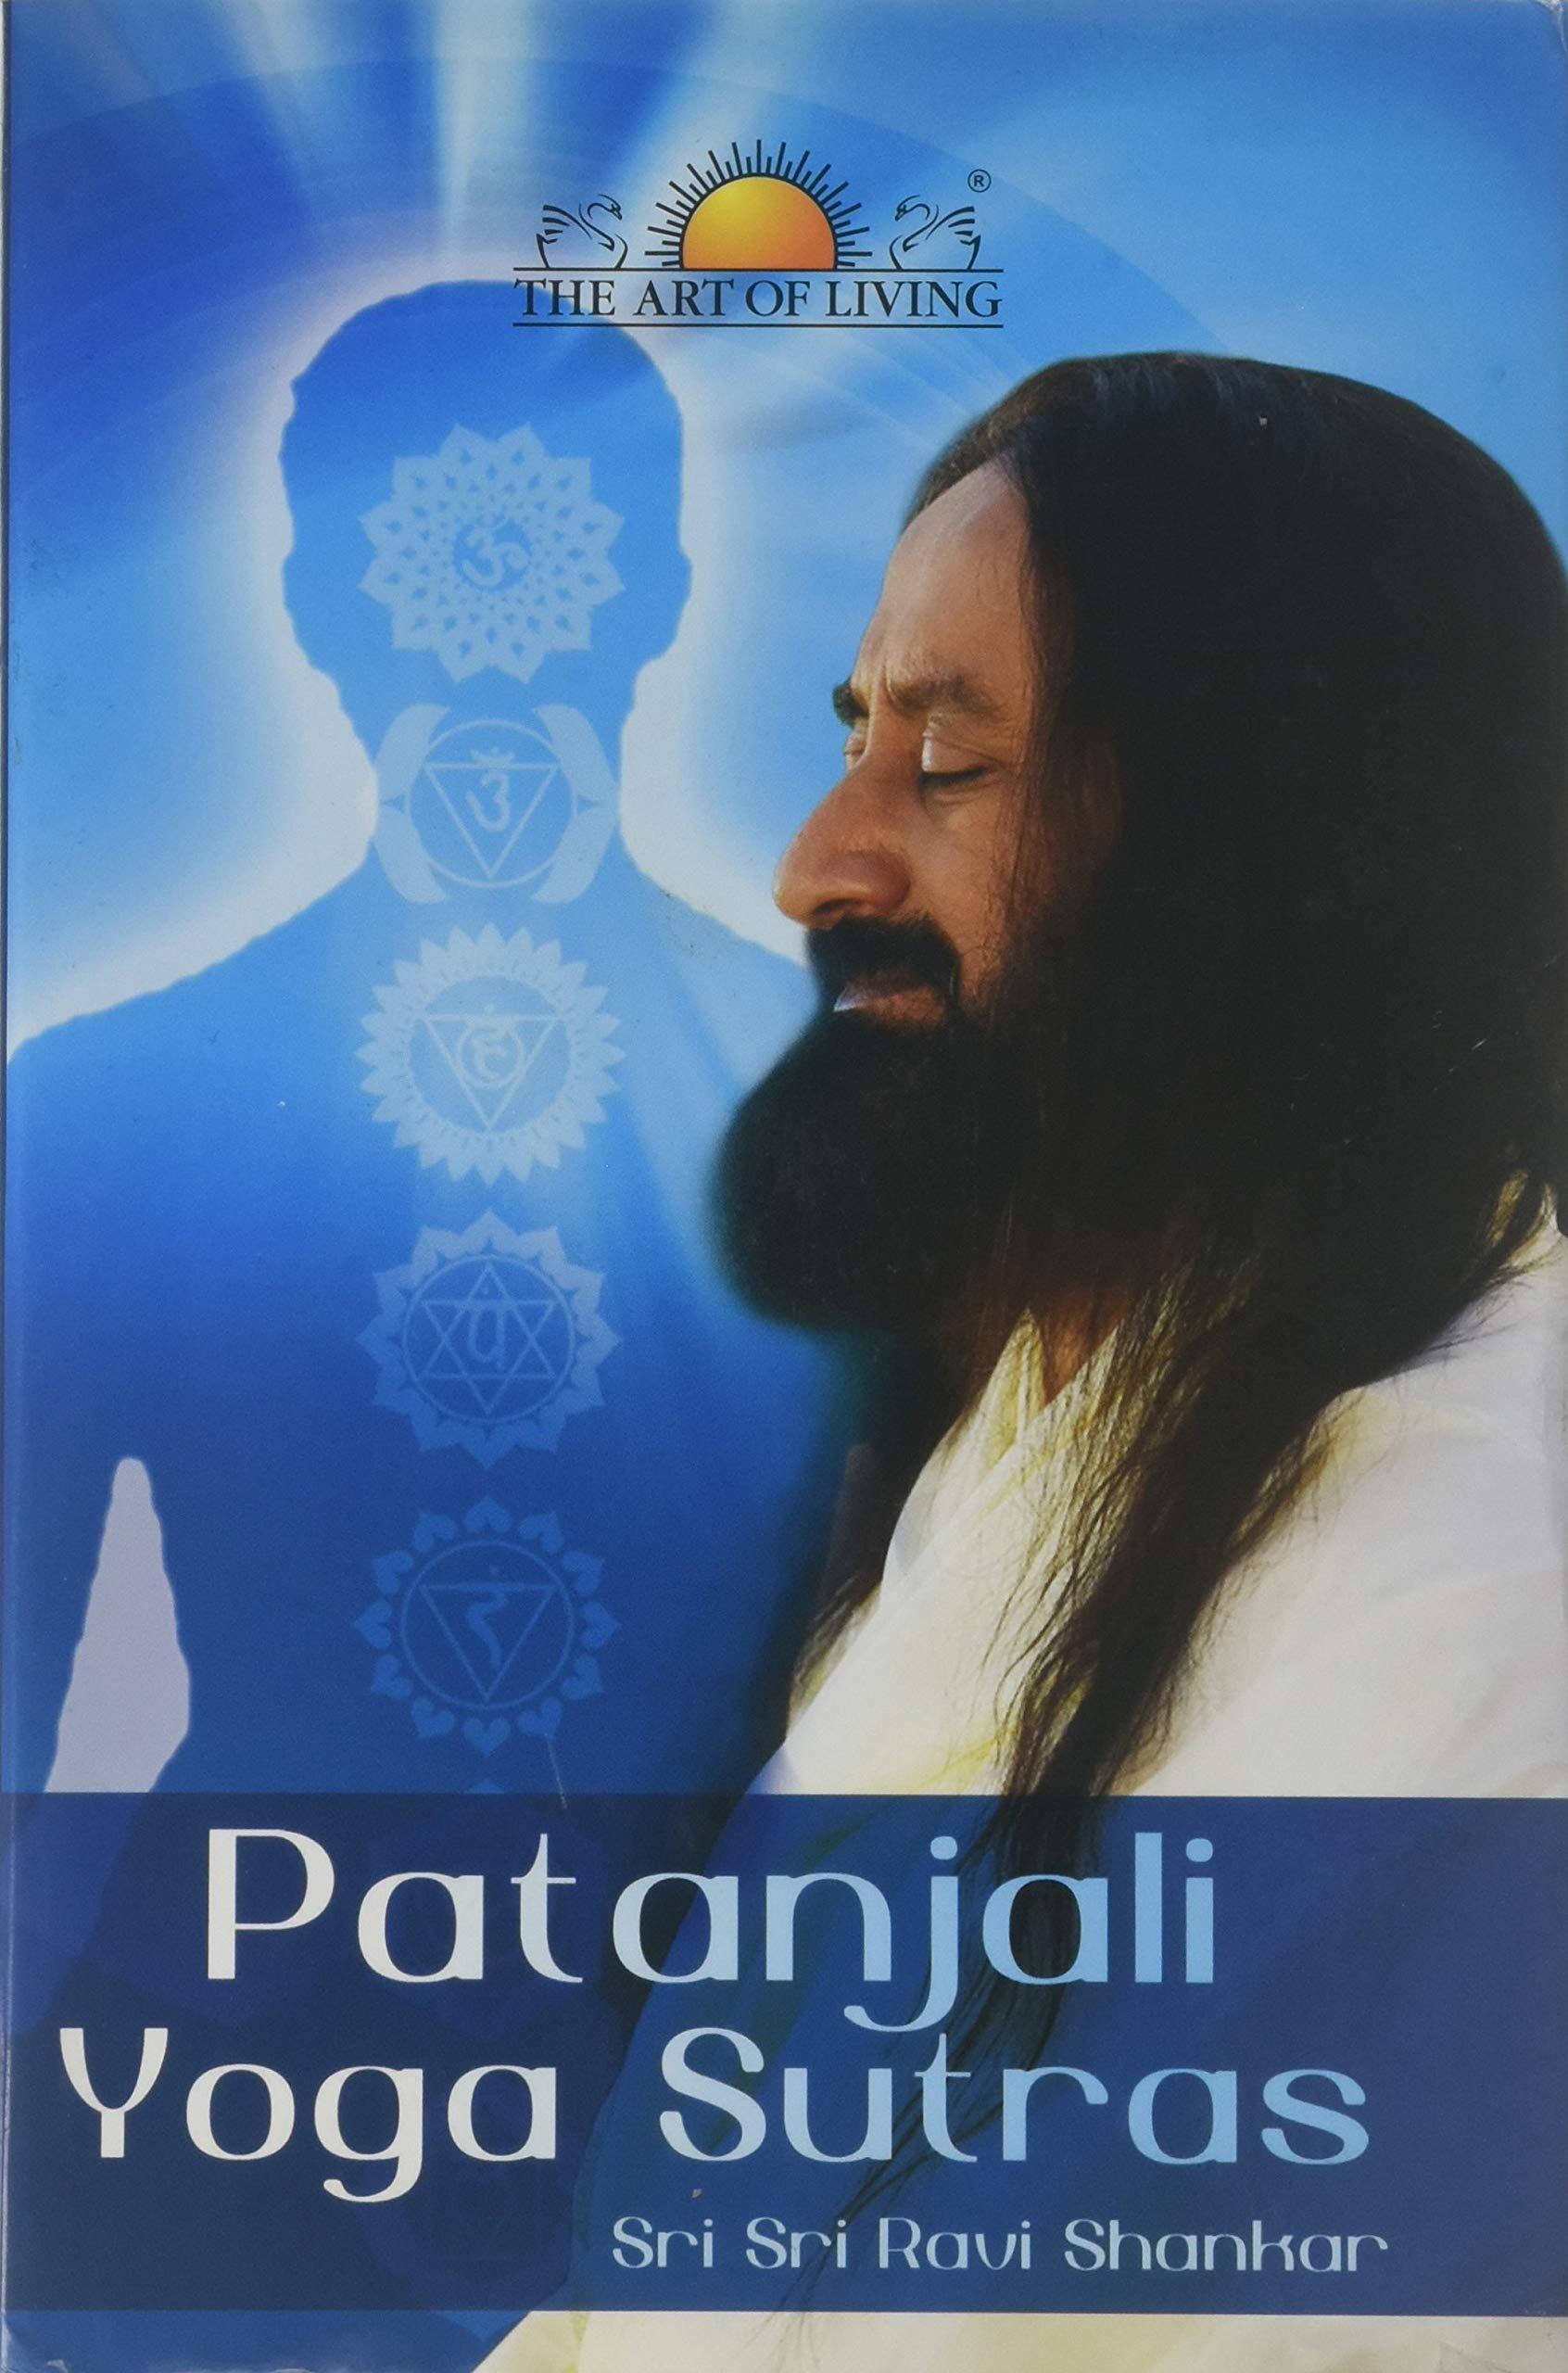 Patanjali Yoga Sutras Sri Sri Ravi Shankar 9789380592817 Amazon Com Books